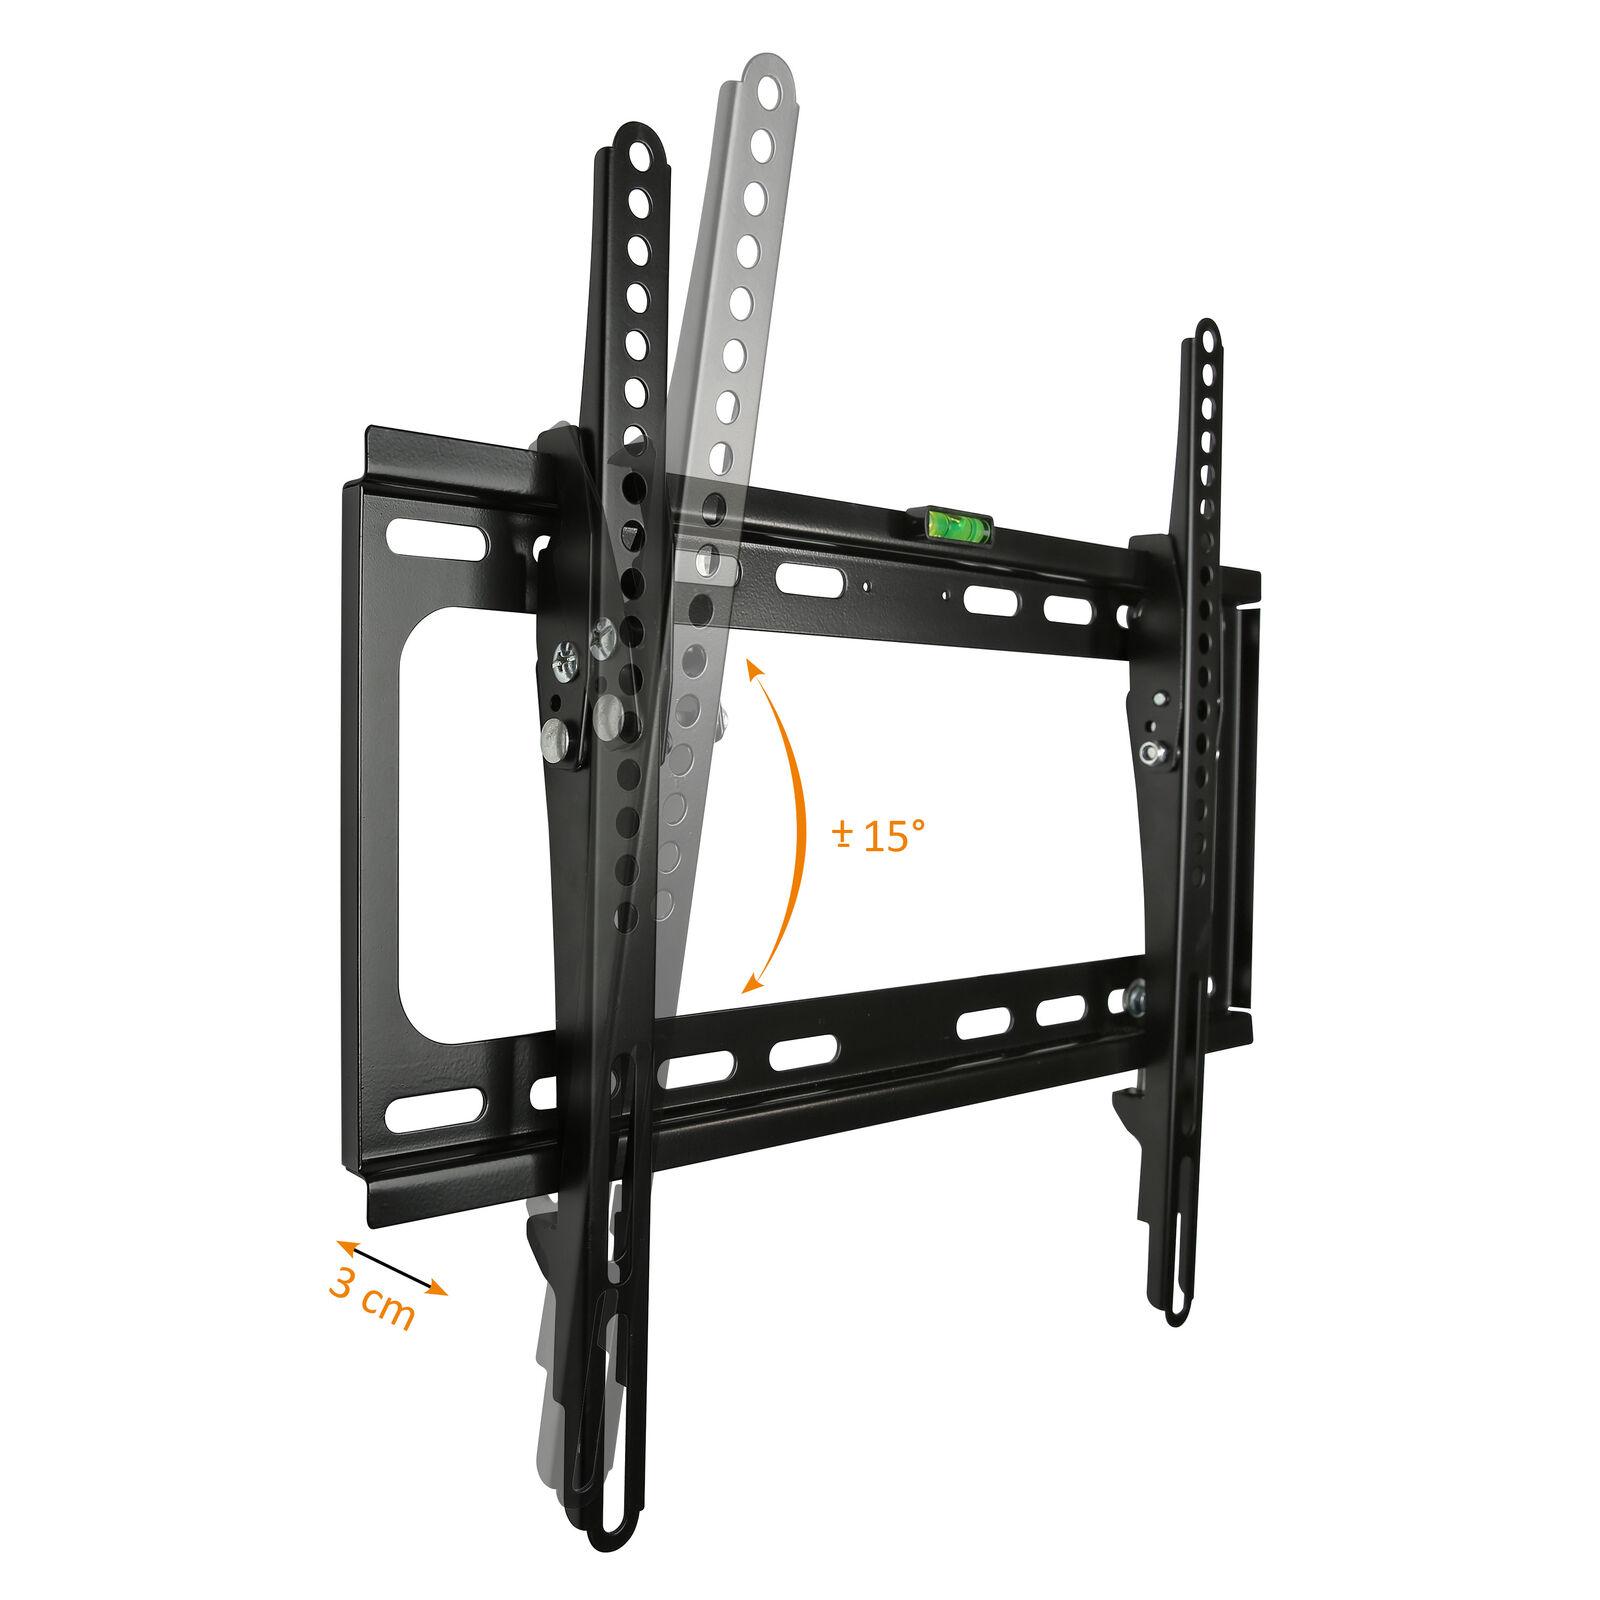 LCD Plasma TV Wandhalter Wandhalterung neigbar kippbar LED 3D 20 - 55 Zoll